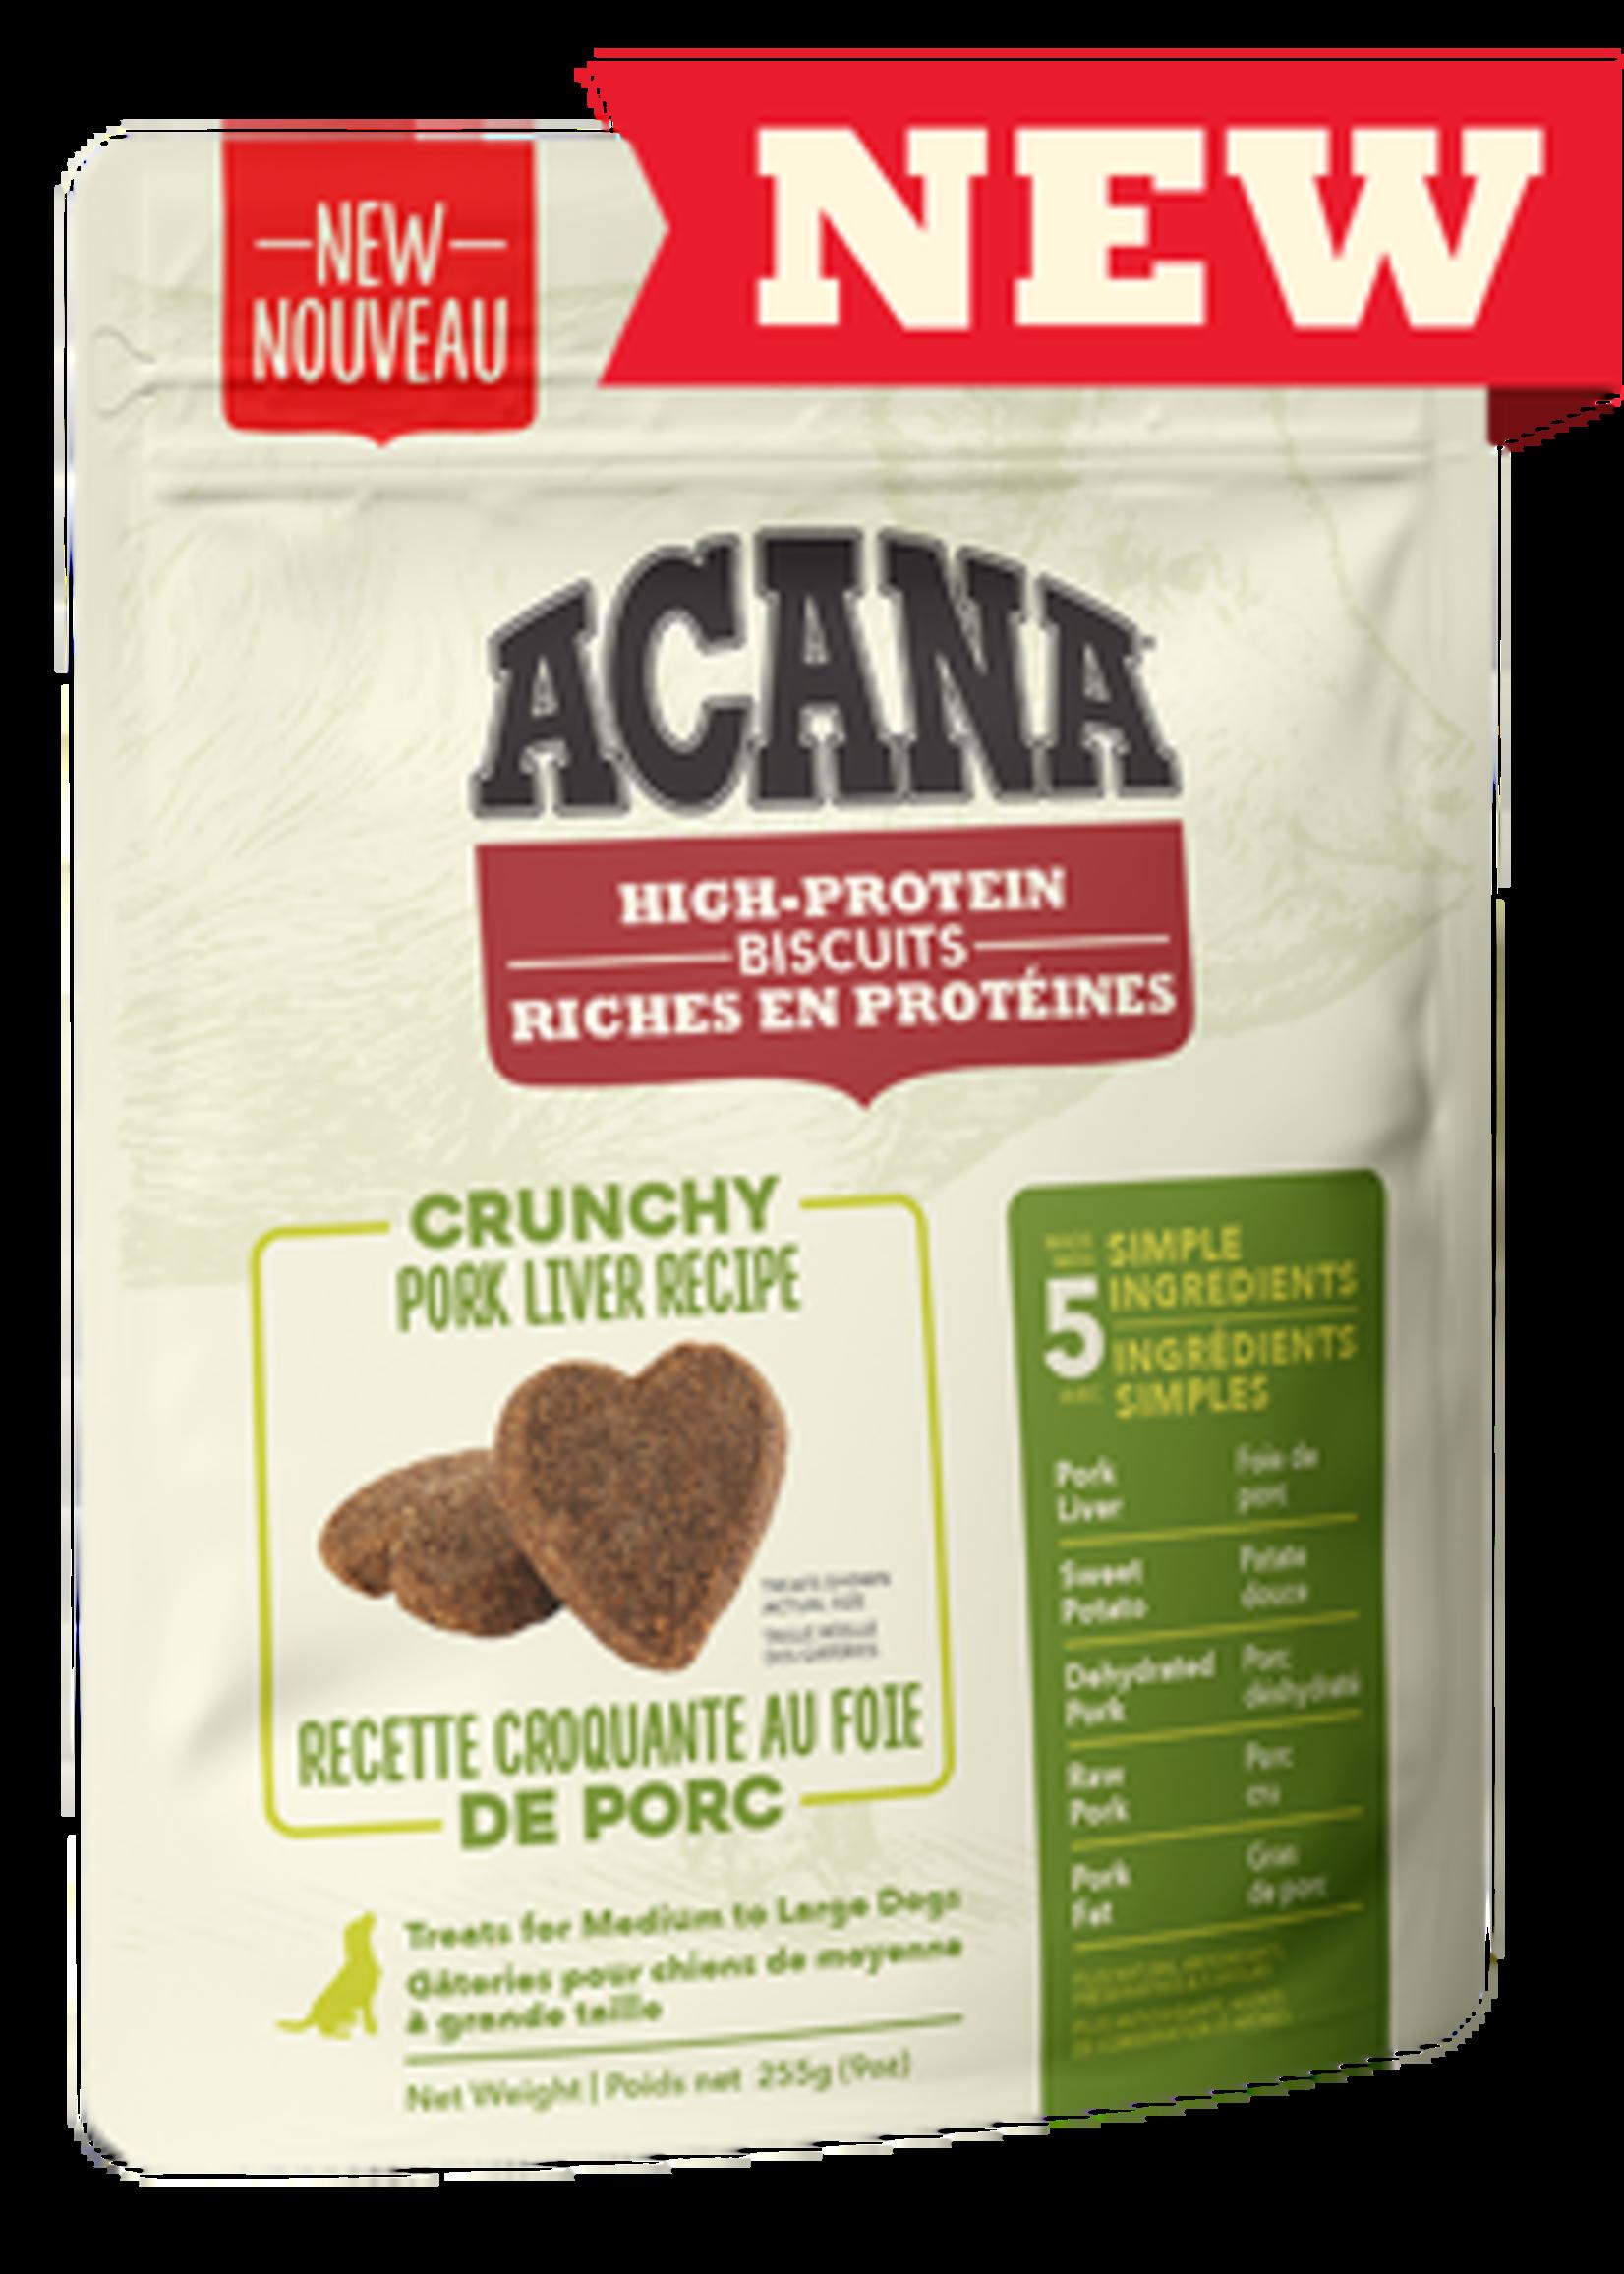 Acana® Acana High-Protein Biscuits, Crunchy Pork Liver Recipe 9oz Large